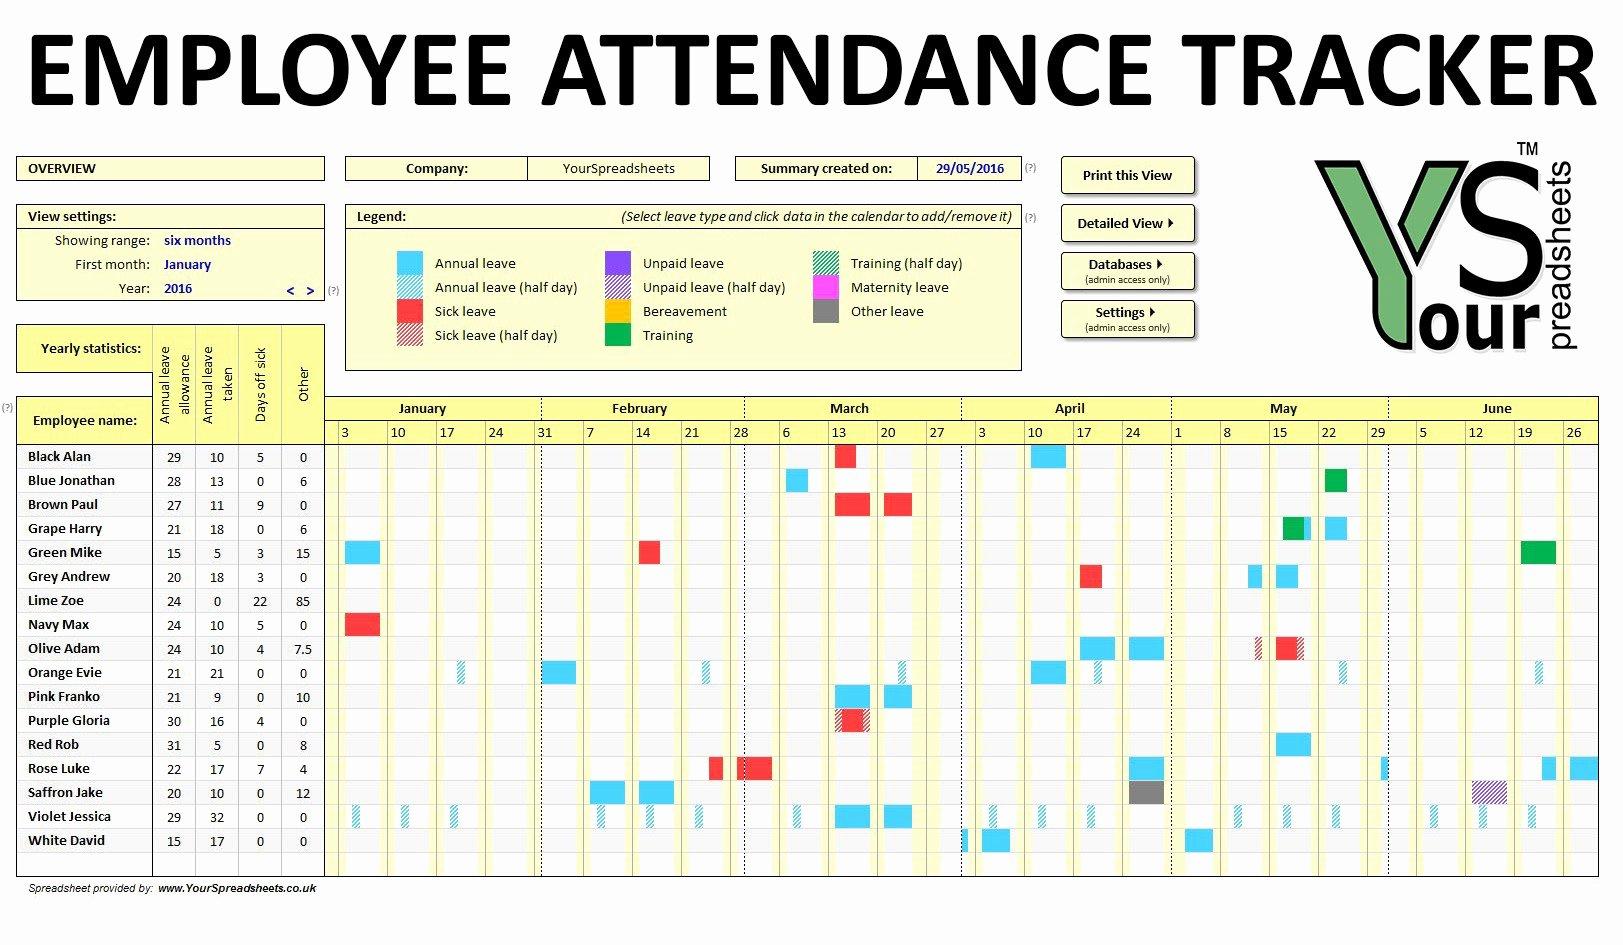 Leave Tracker Excel Template New Employee attendance Calendar 2017 attendance Tracker